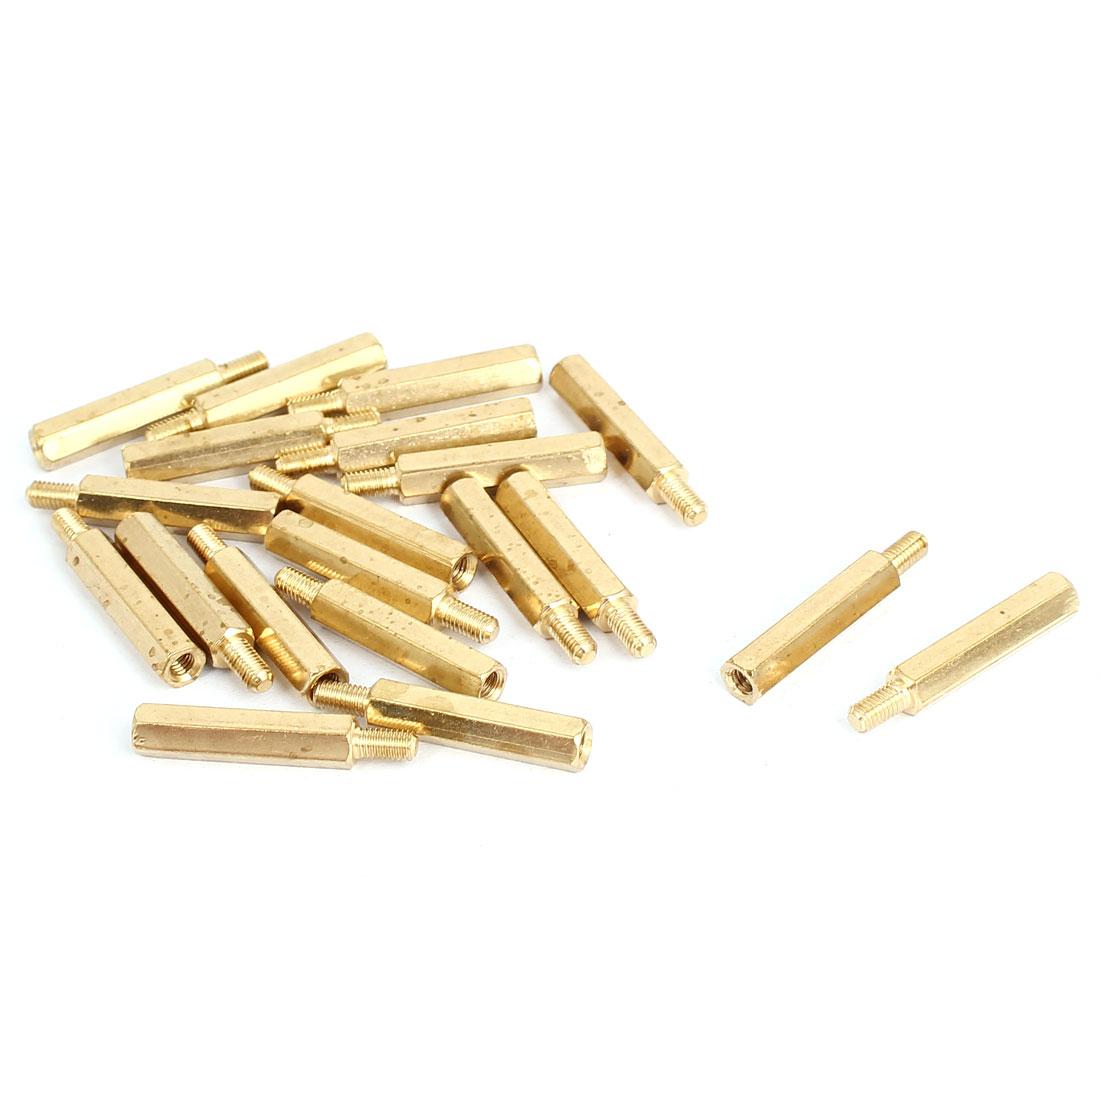 M3x21mm+6mm Male to Female Threaded Brass Hex Hexagonal Standoff Spacer Pillar 20pcs